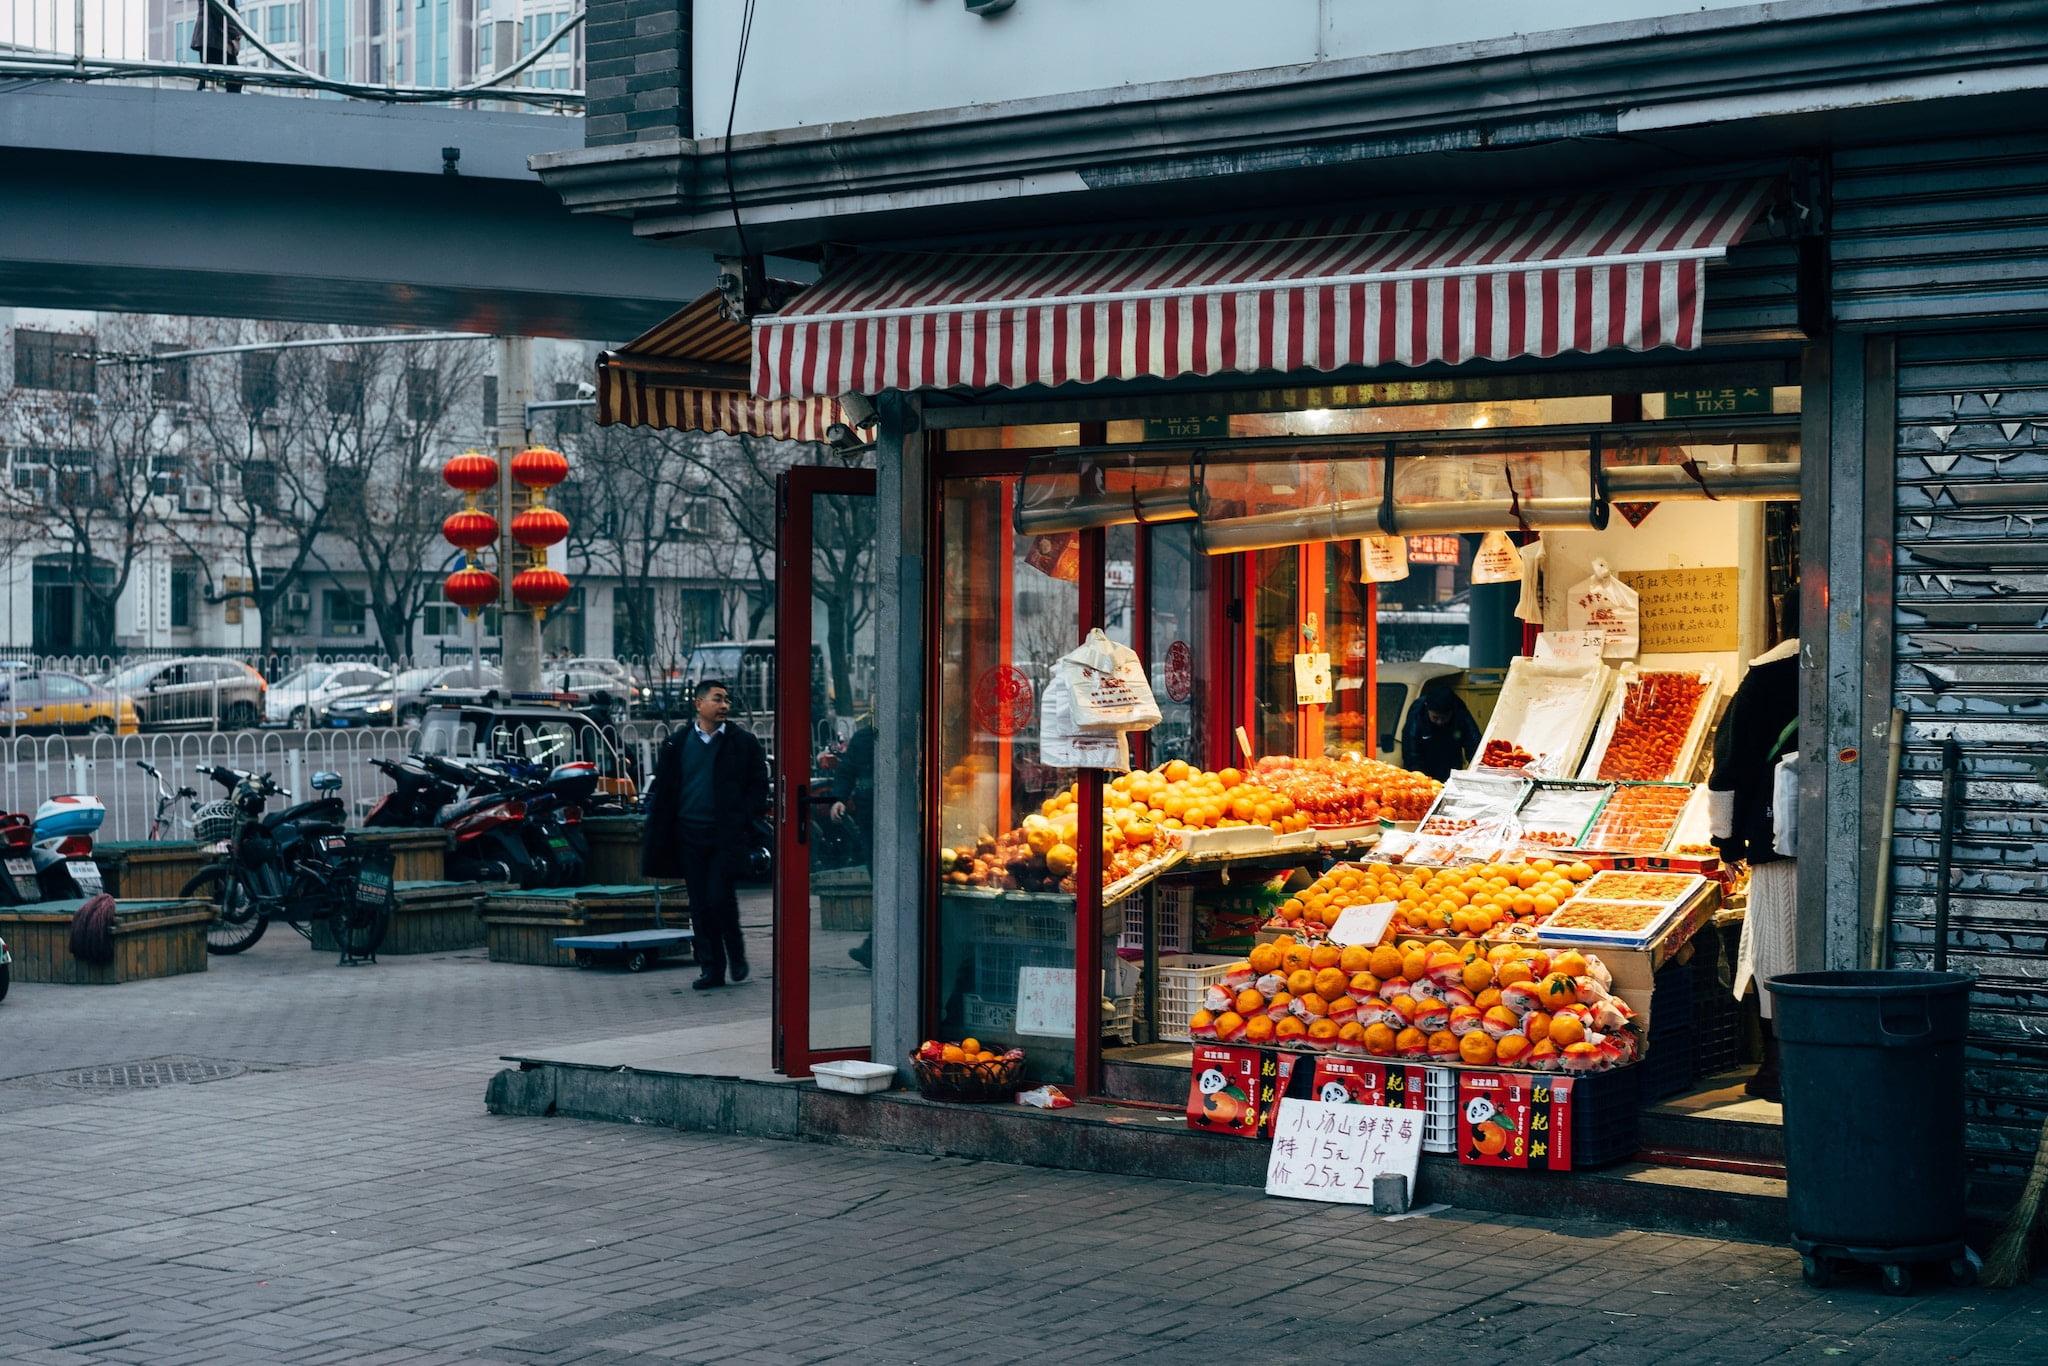 markus-winkler-1468505-unsplash